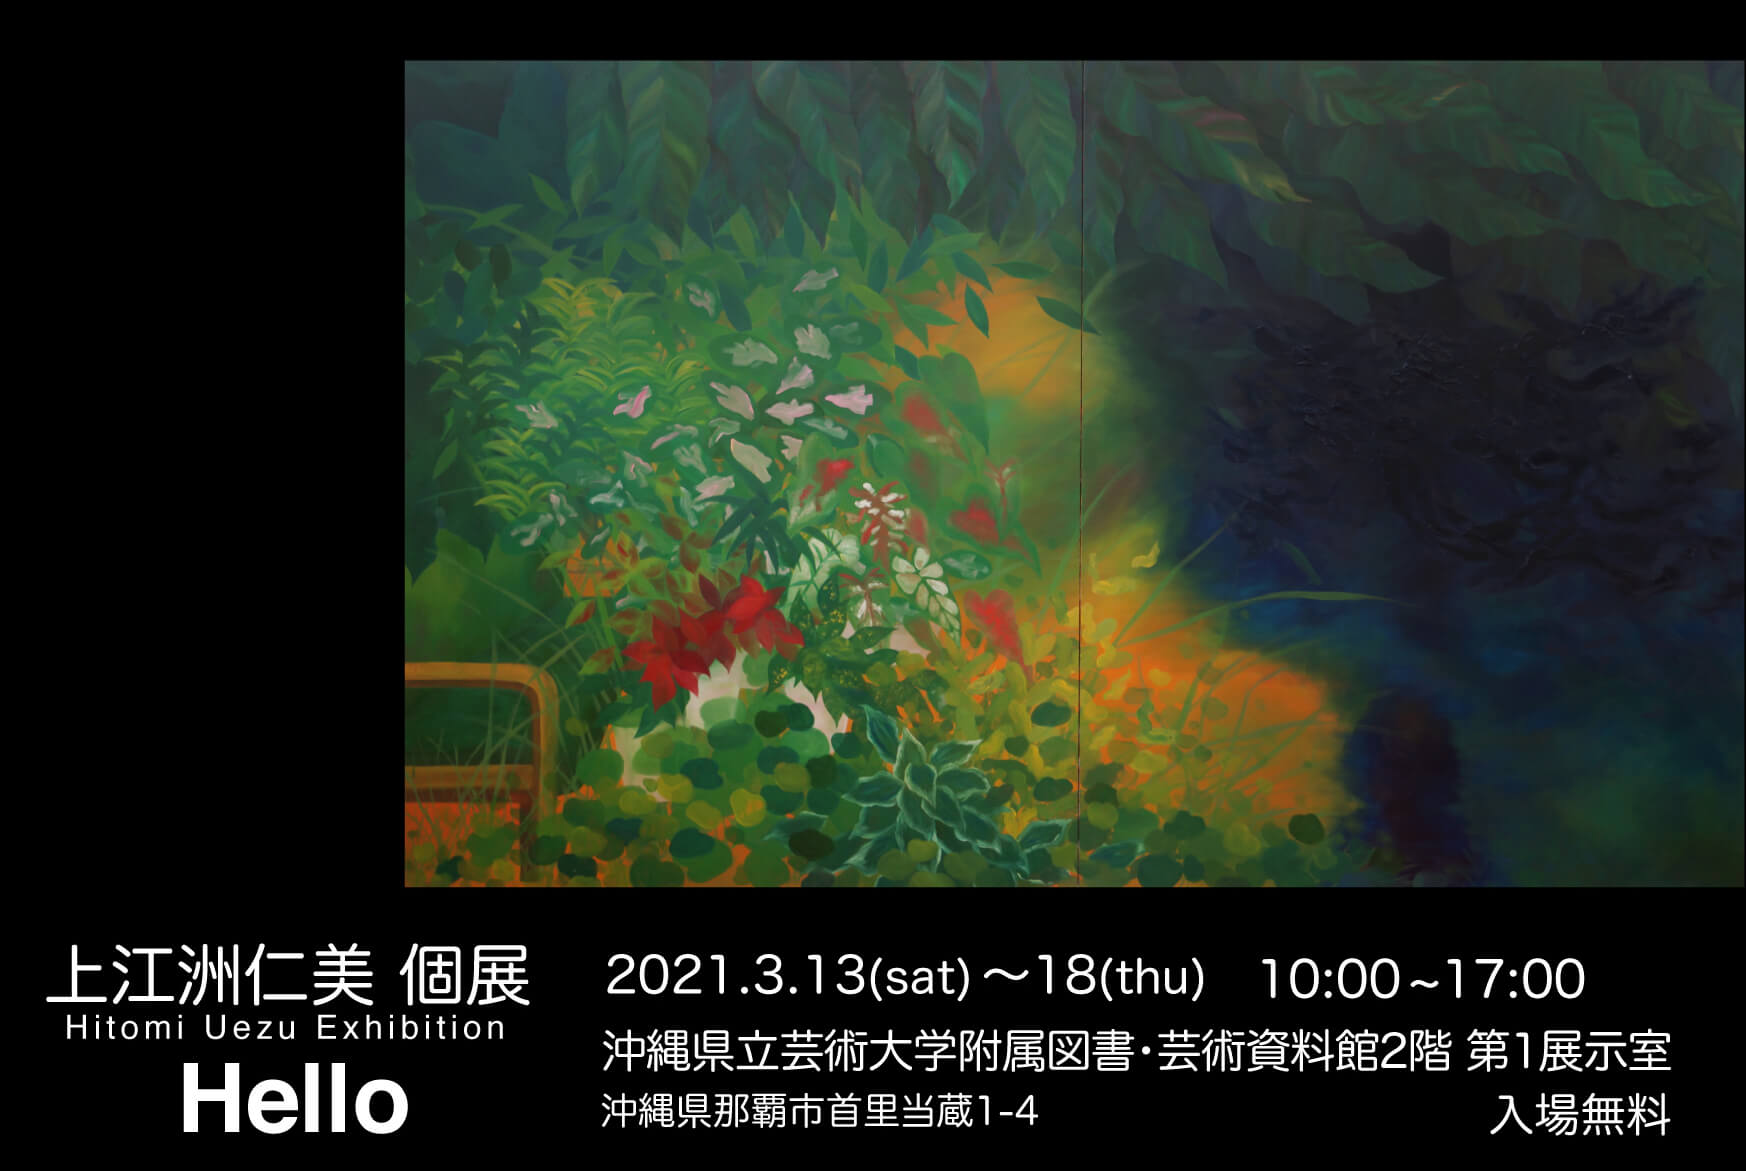 http://www.okigei.ac.jp/wp-content/uploads/2021/02/uezu_hello.jpg